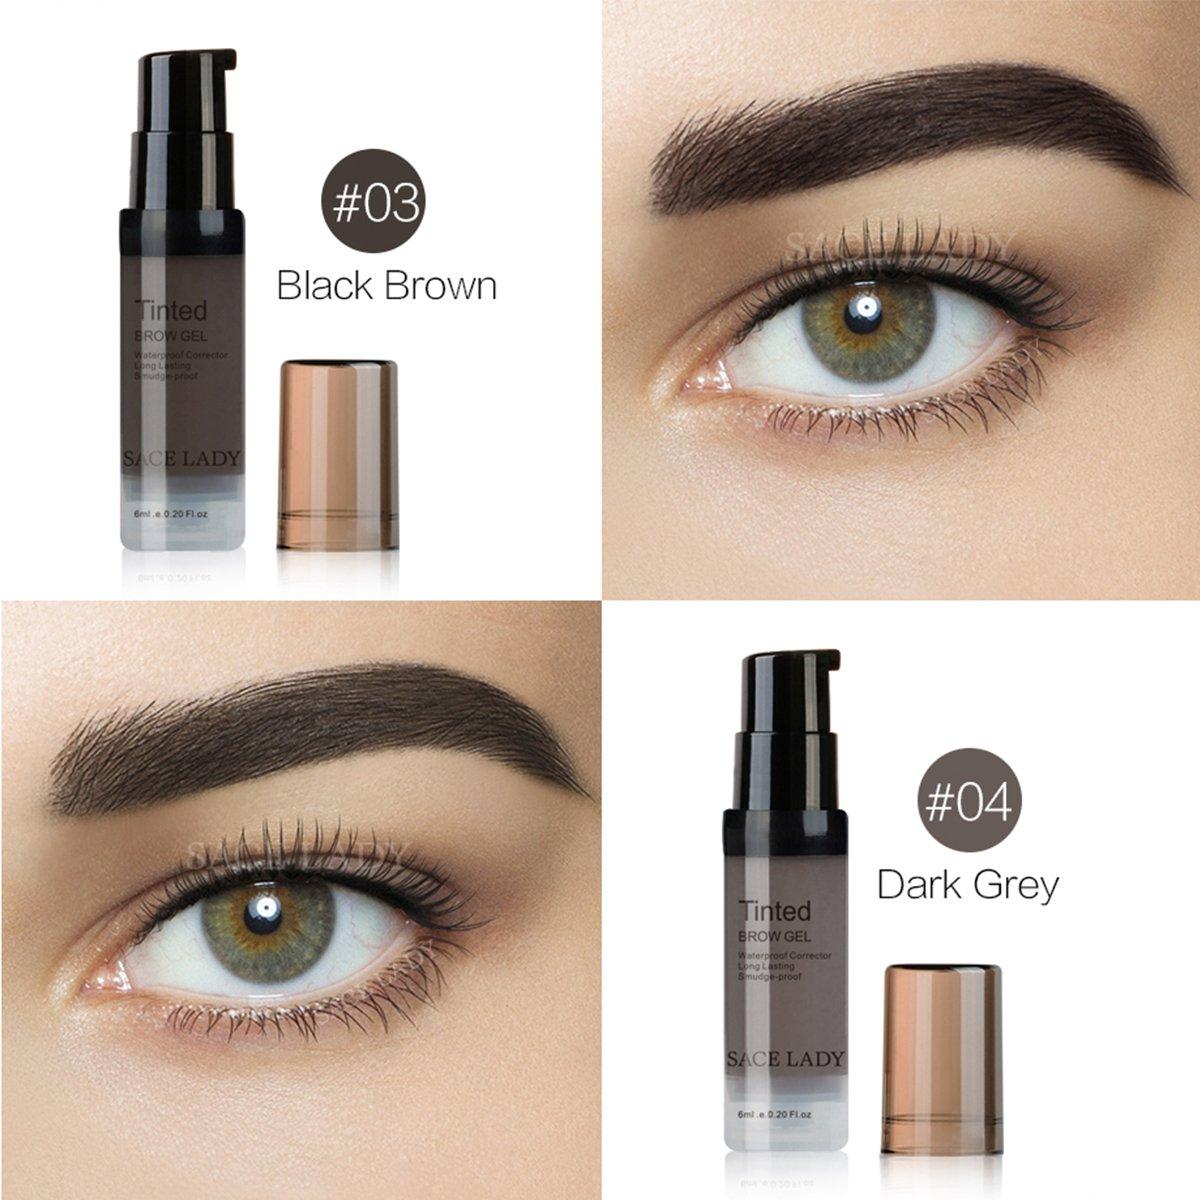 Amazon Sace Lady Tinted Eyebrow Gel Long Lasting Waterproof